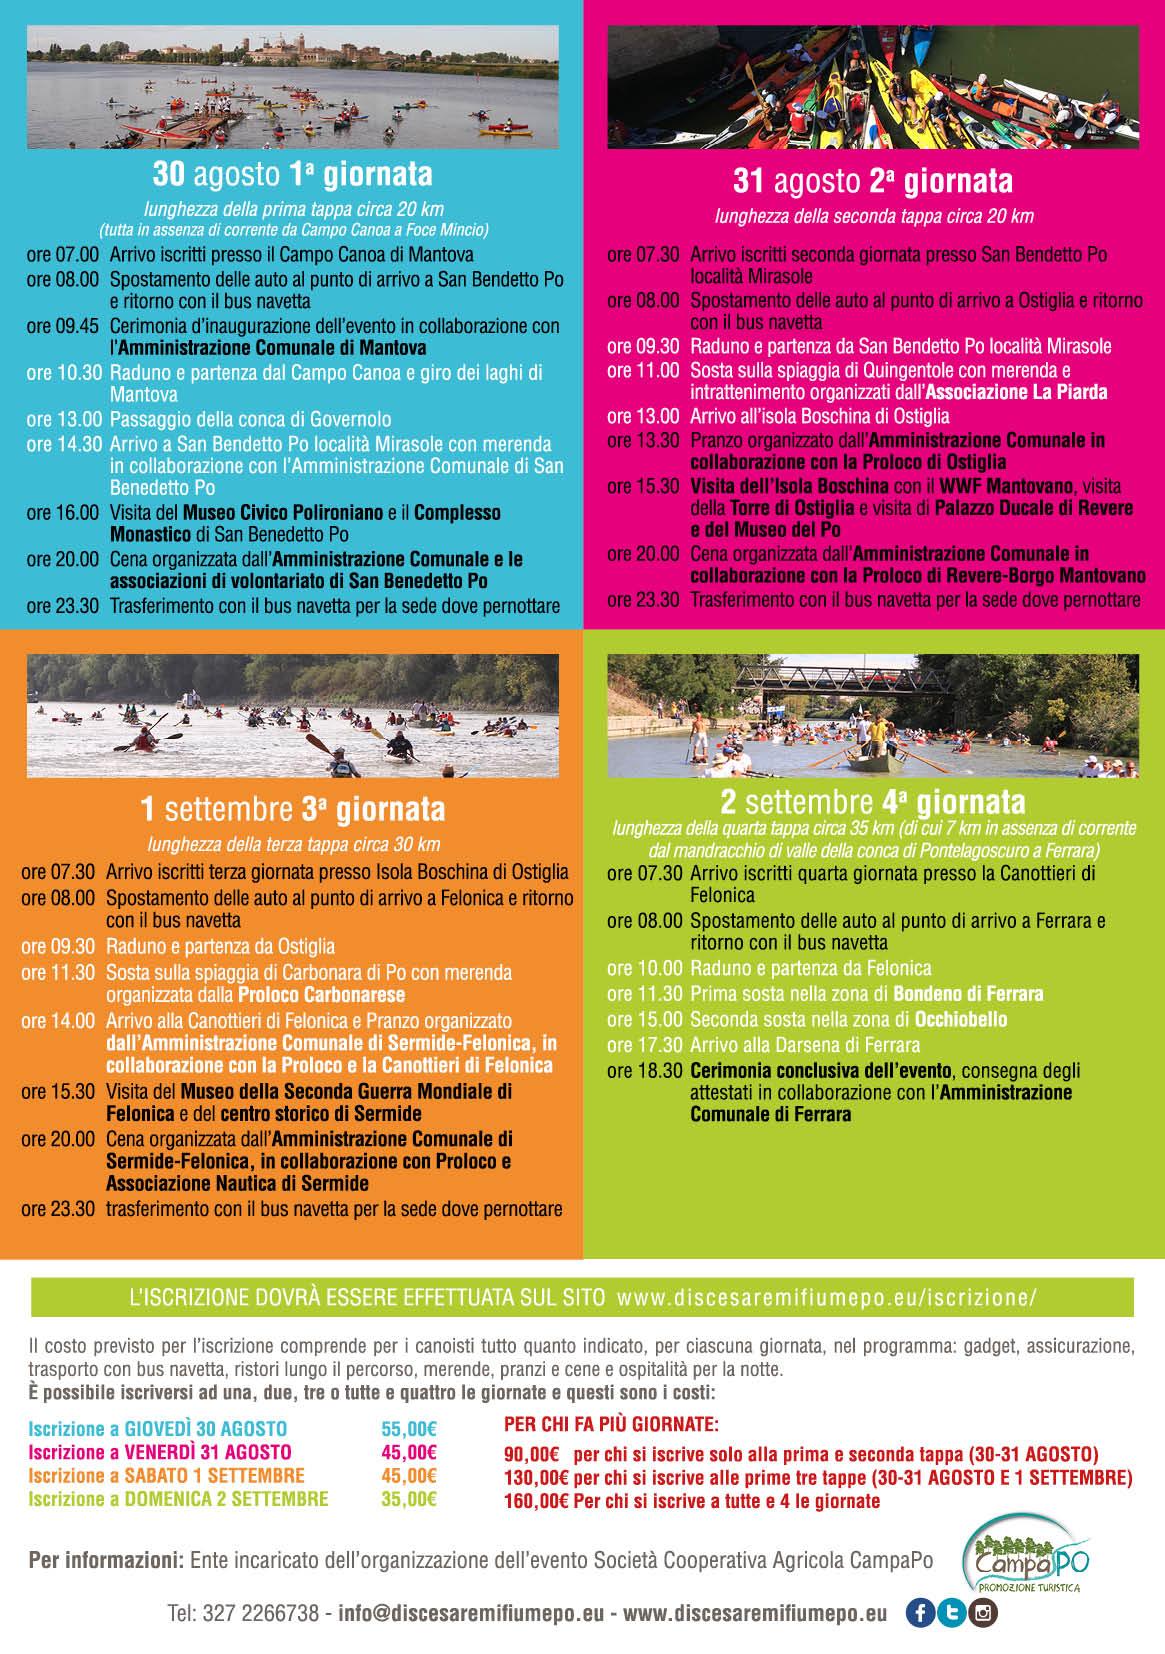 Programma della seconda discesa a remi Mantova Ferrara